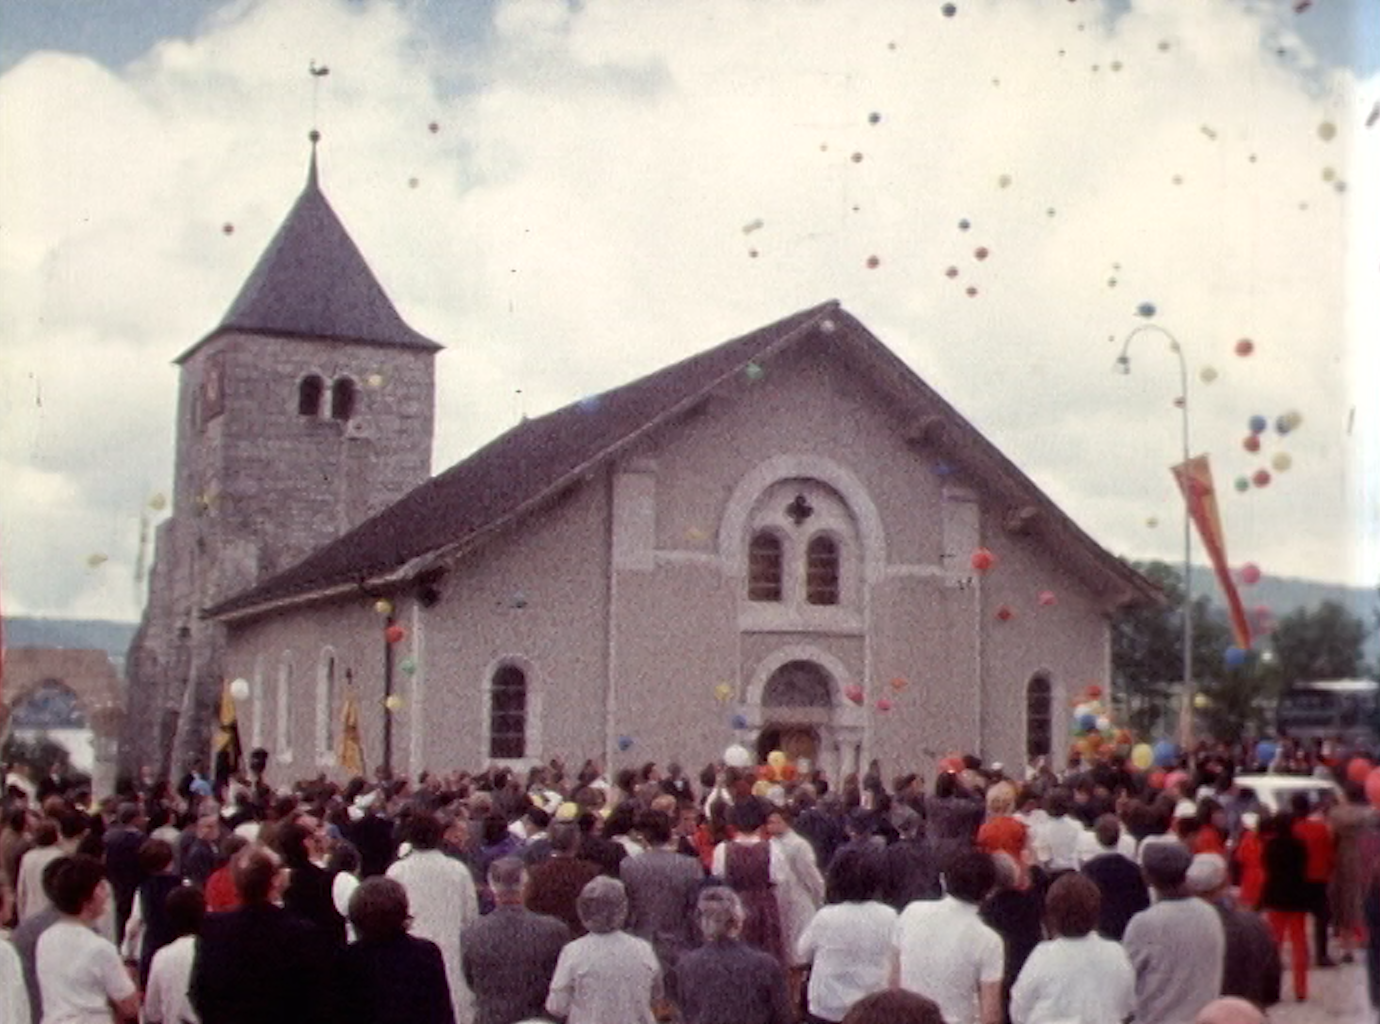 L'Abbaye a 400 ans